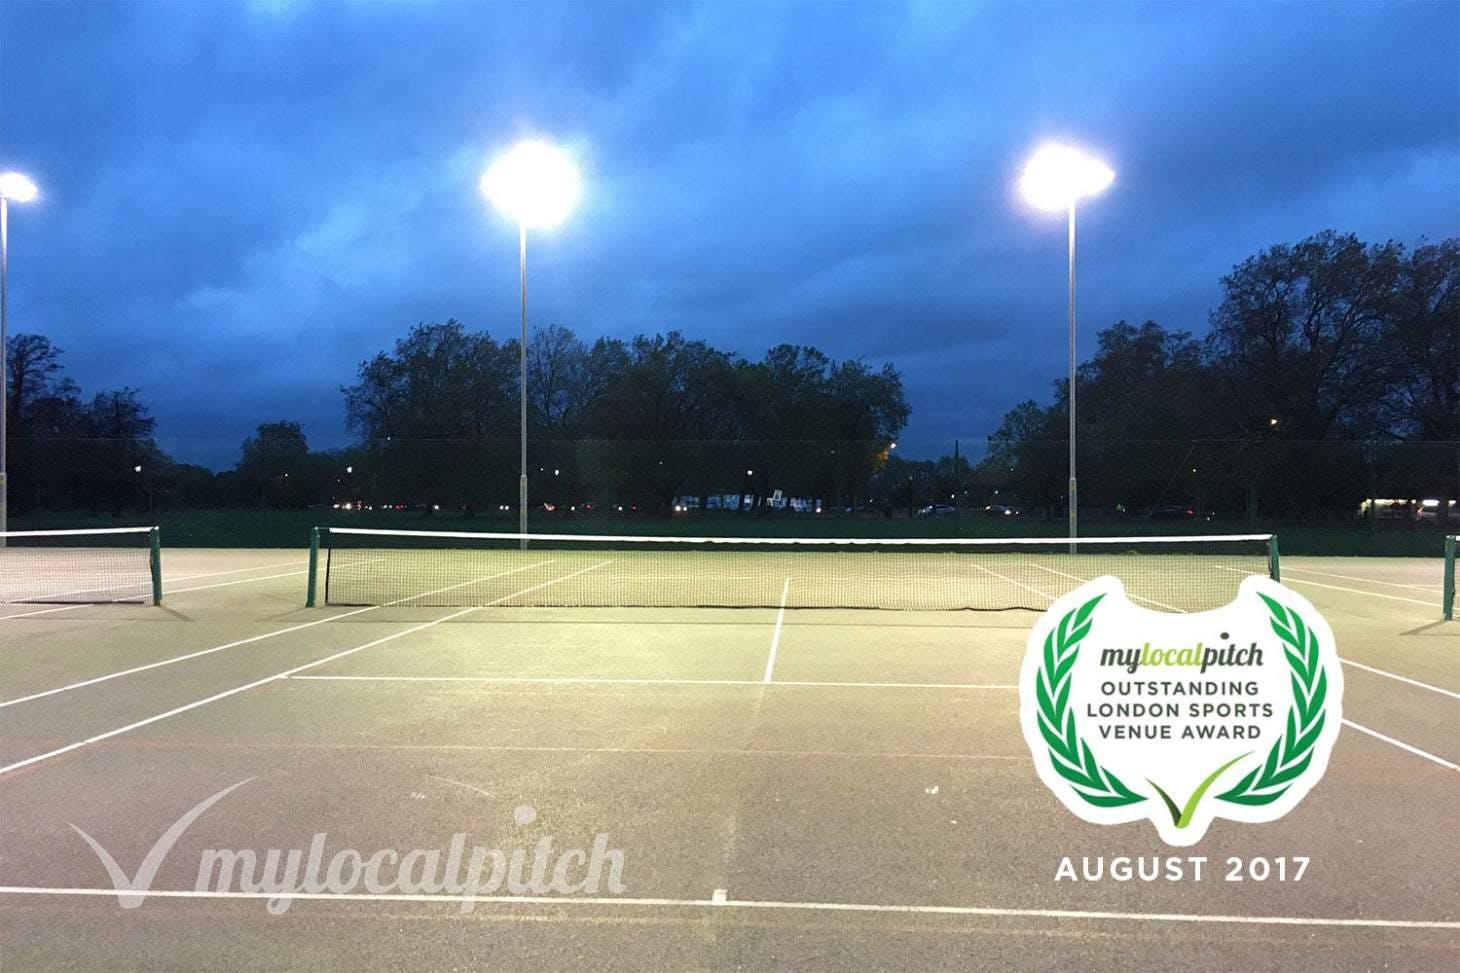 Clapham Common Outdoor | Hard (macadam) tennis court